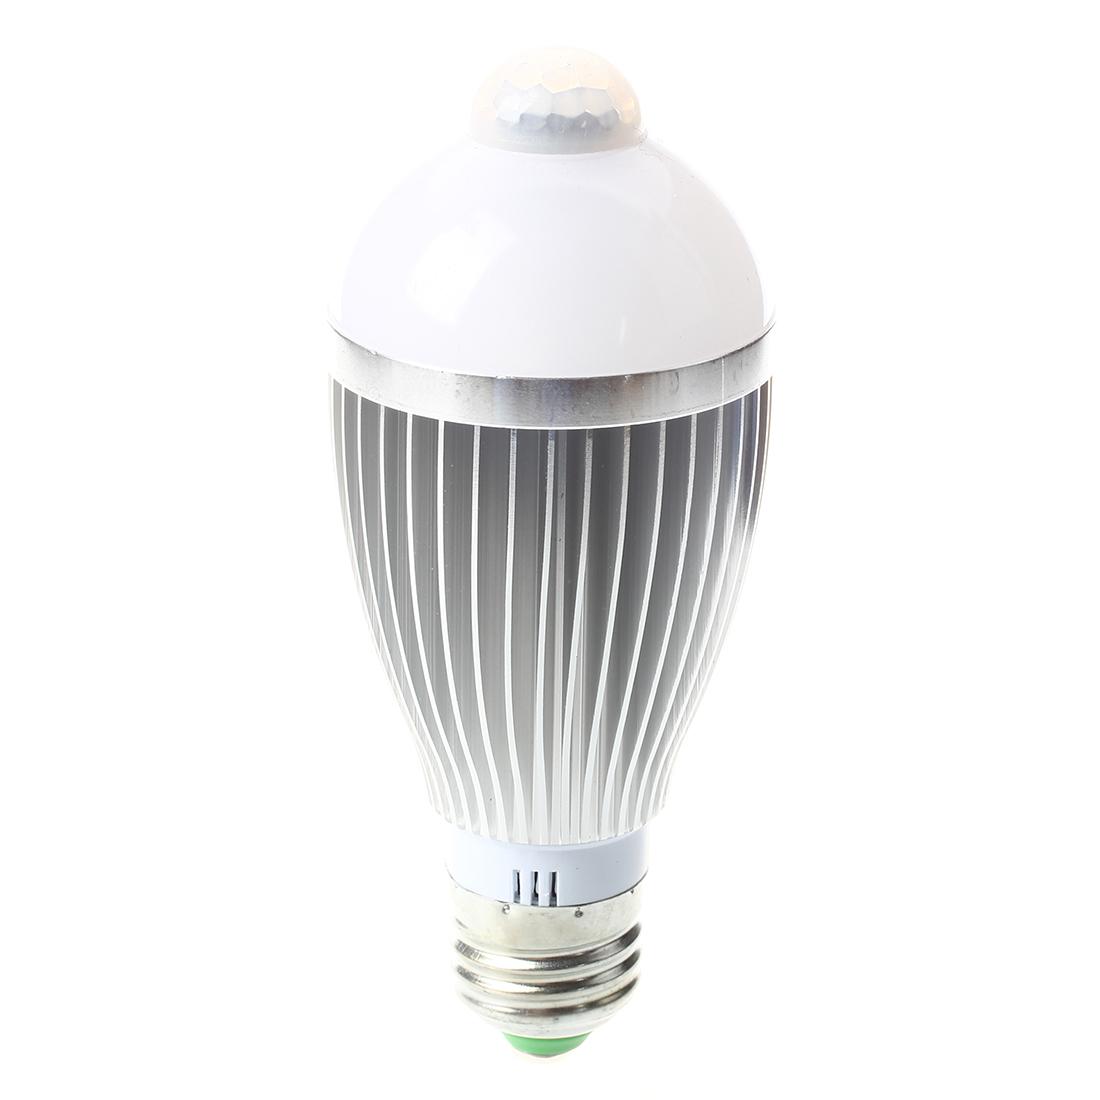 2x e27 ir bewegungsmelder a g6 led birne lampe 6w 600lm licht a1. Black Bedroom Furniture Sets. Home Design Ideas